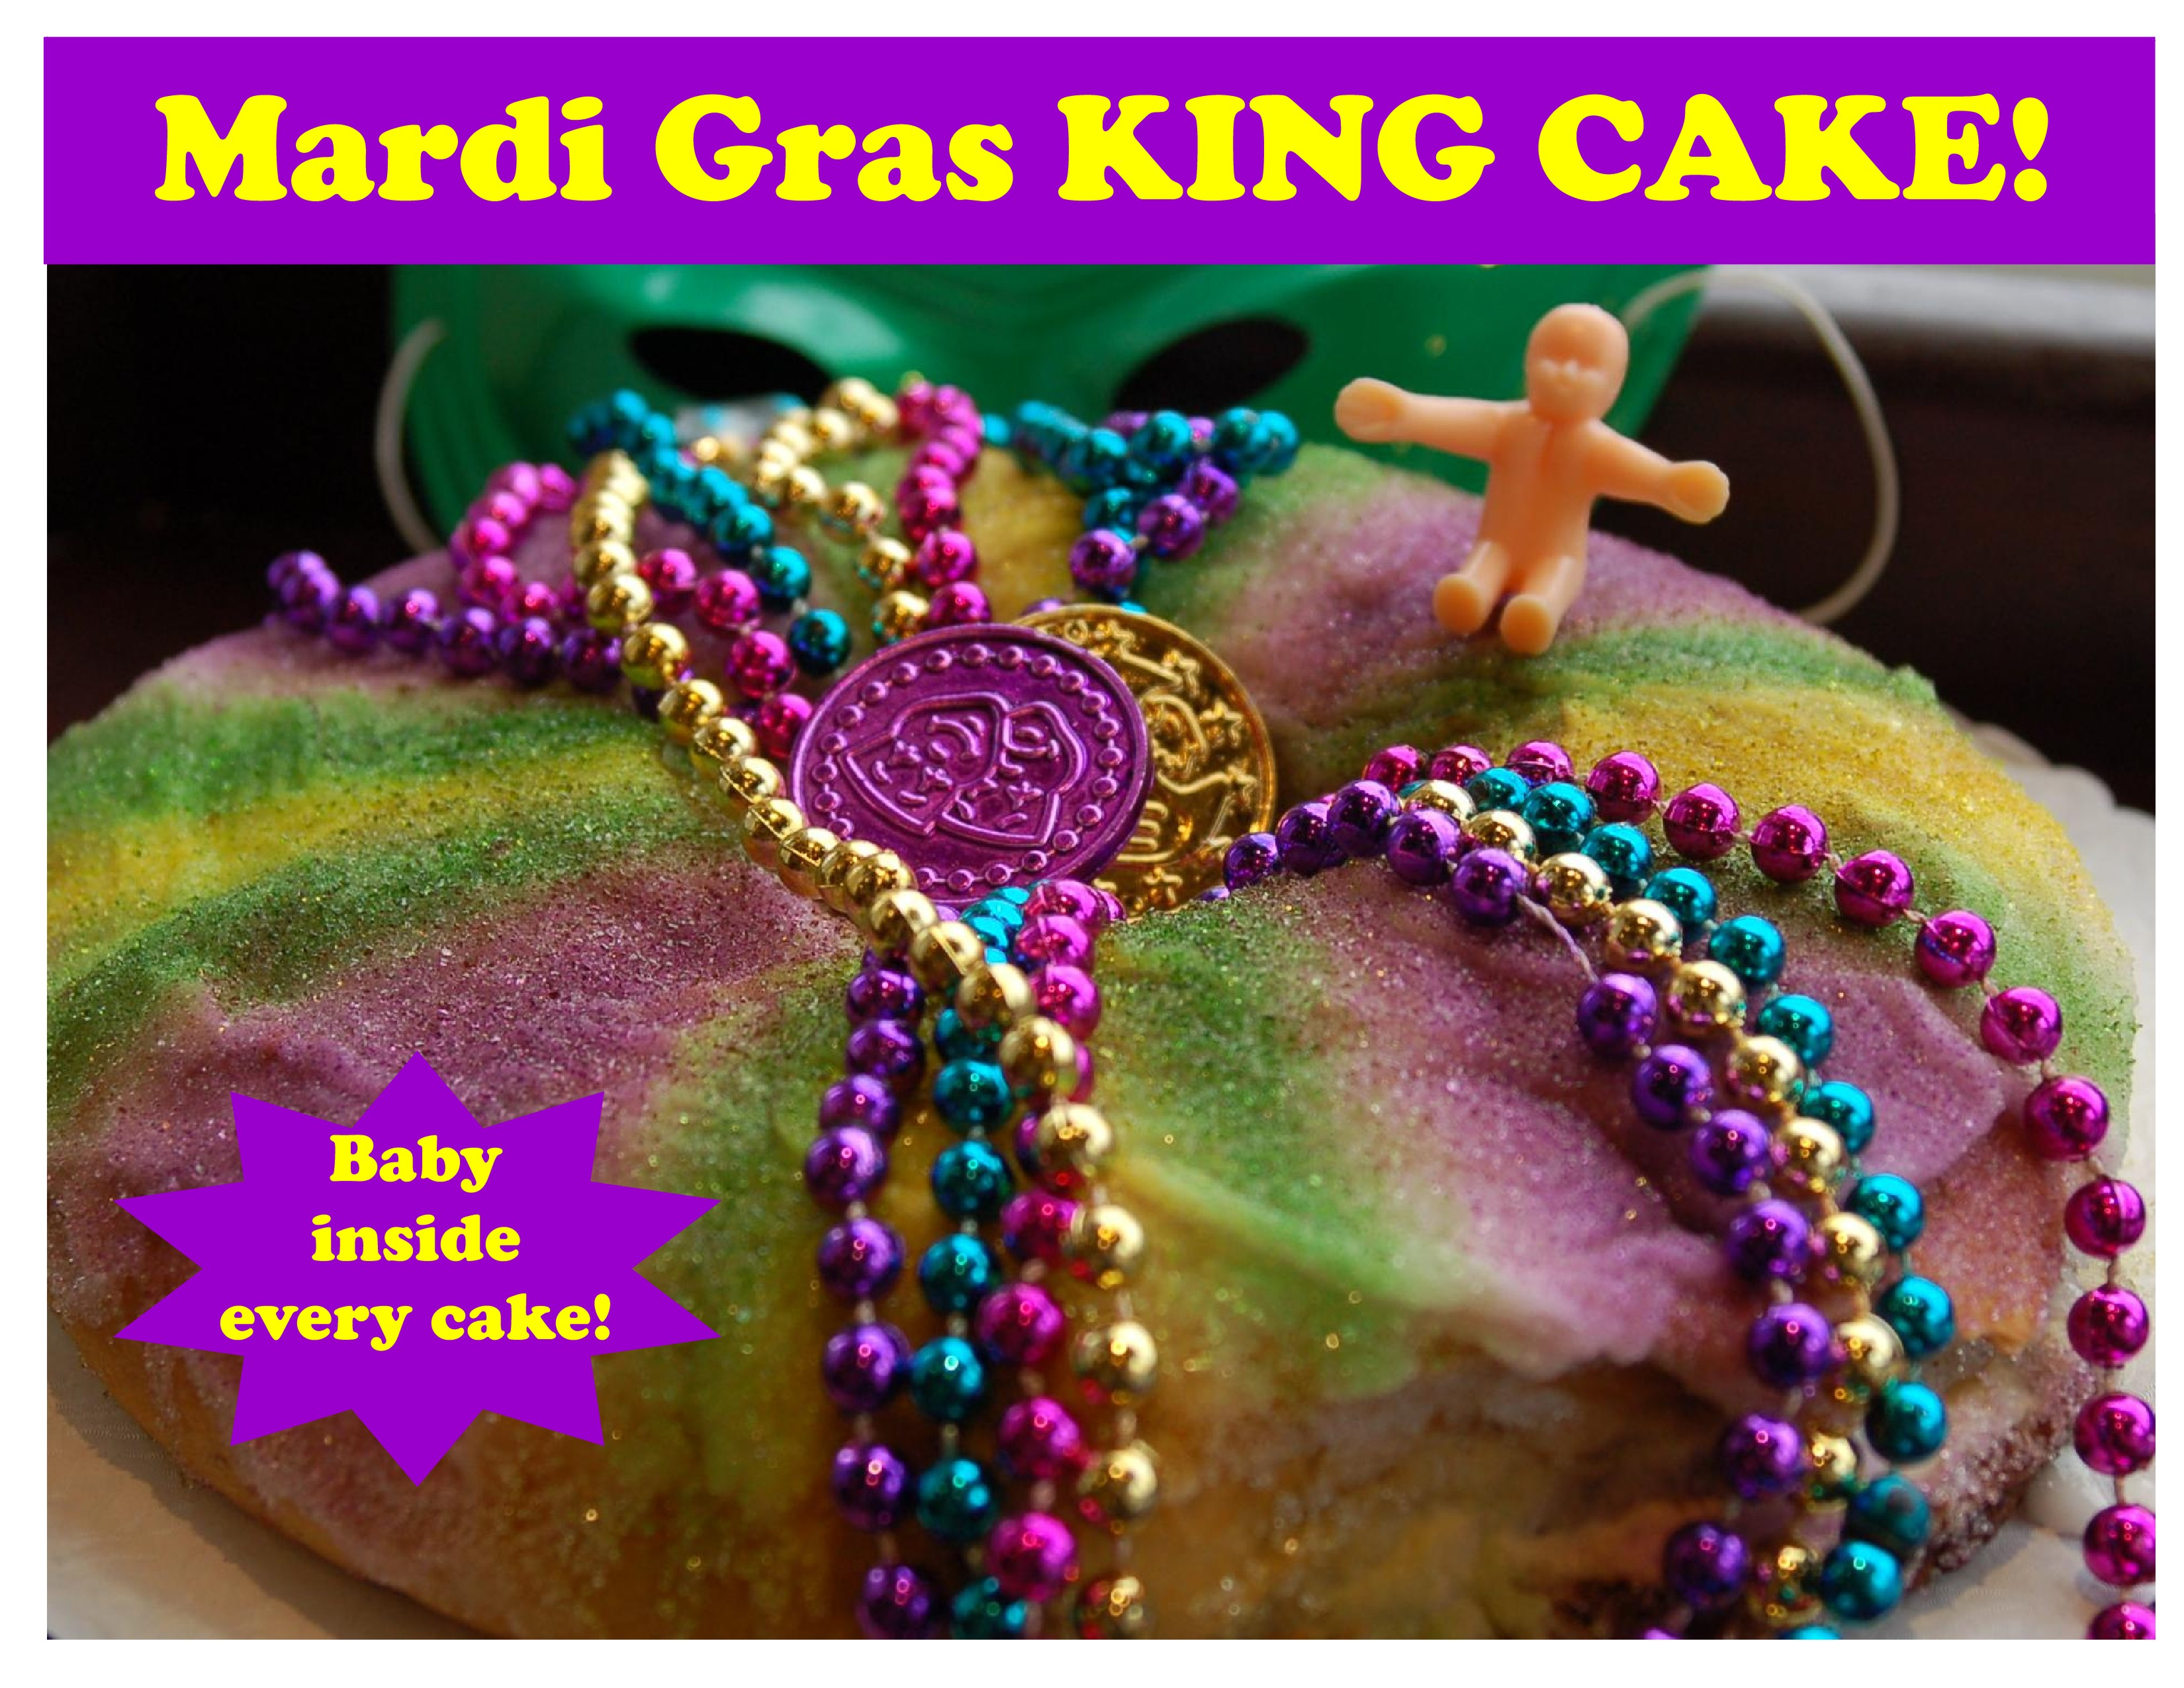 Mardi Gras King Cake Slide 2018